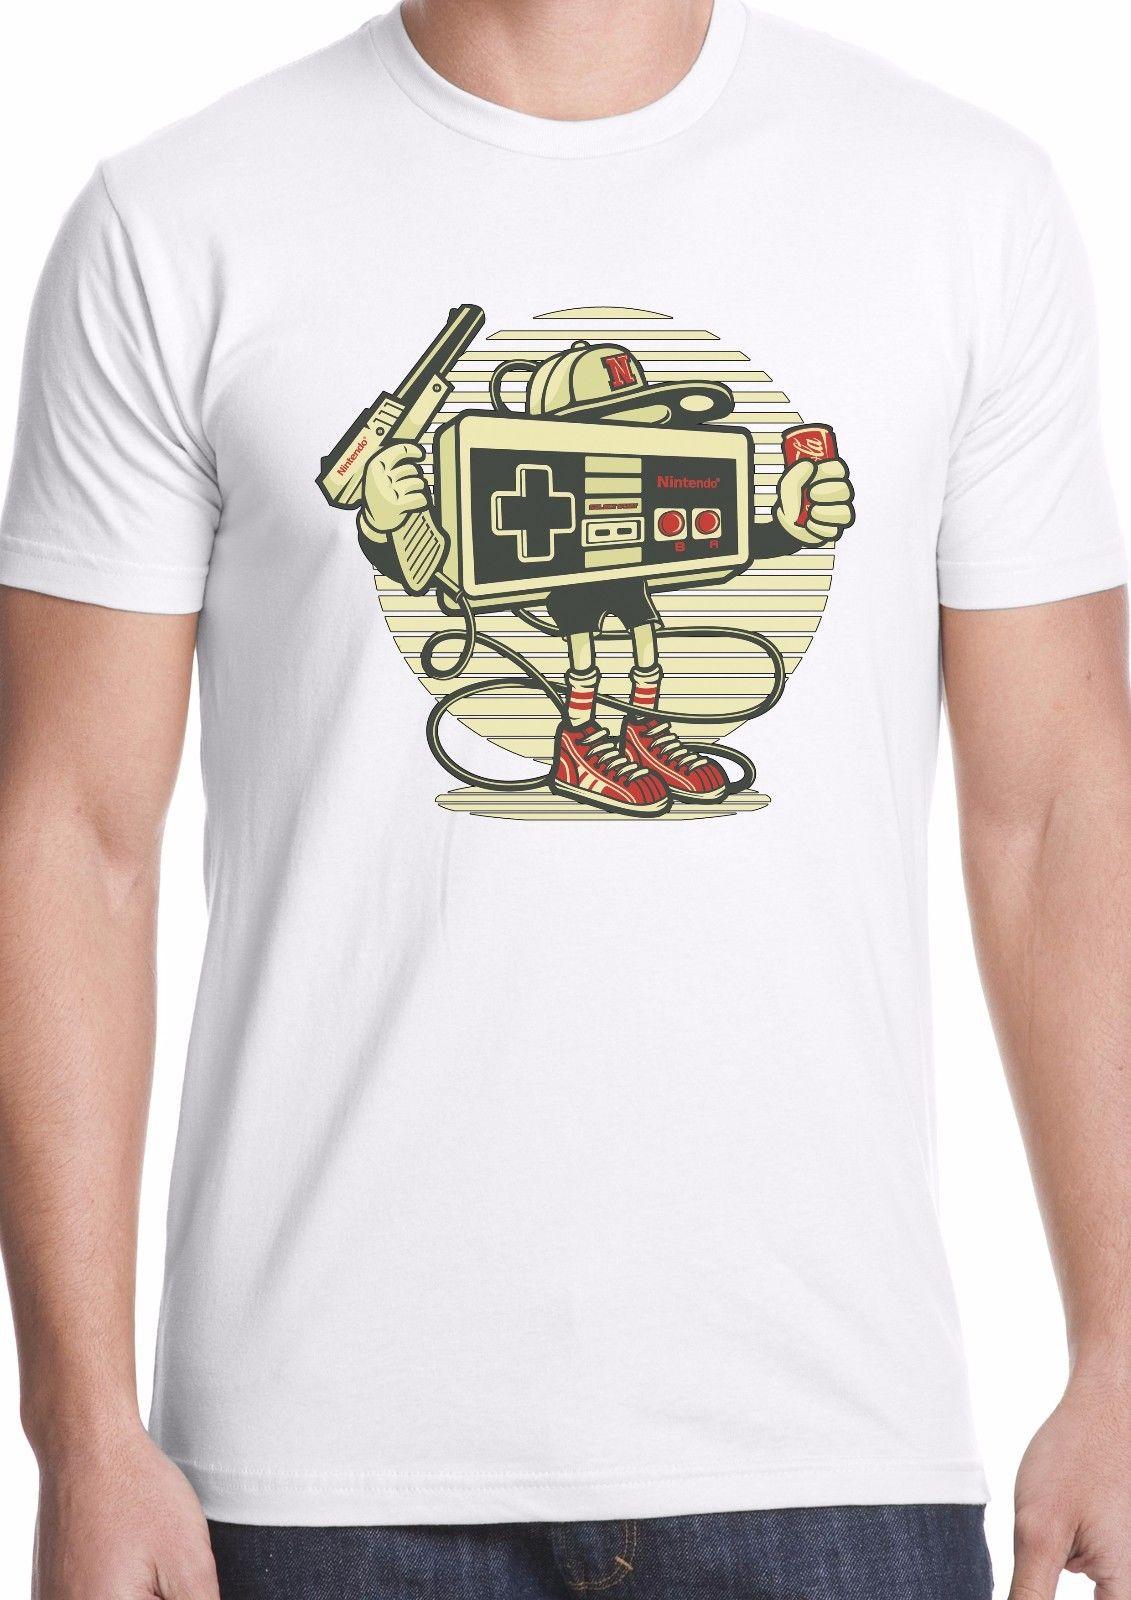 Nintendo t-shirt retro gaming pad Zelda Mario nes snes game computer console Summer Men'S fashion Tee,Comfortable t shirt